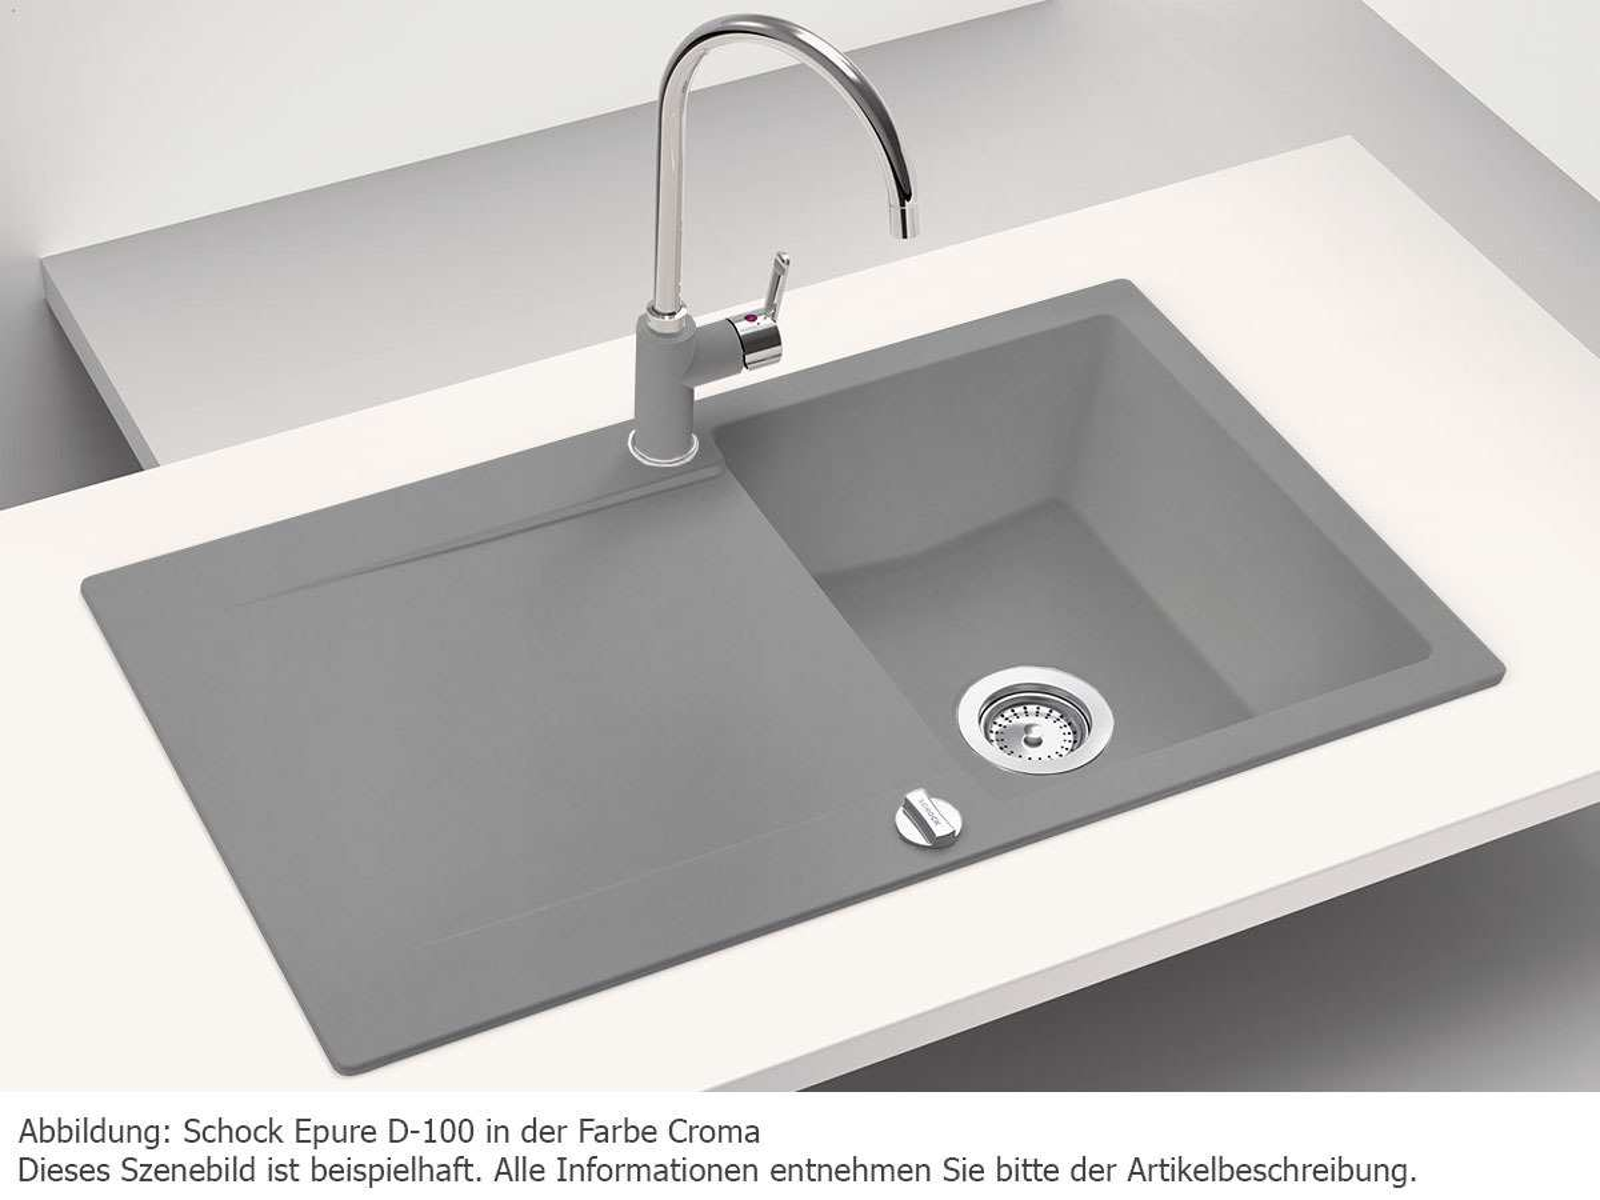 Schock Epure D-100 A Onyx Granitspüle